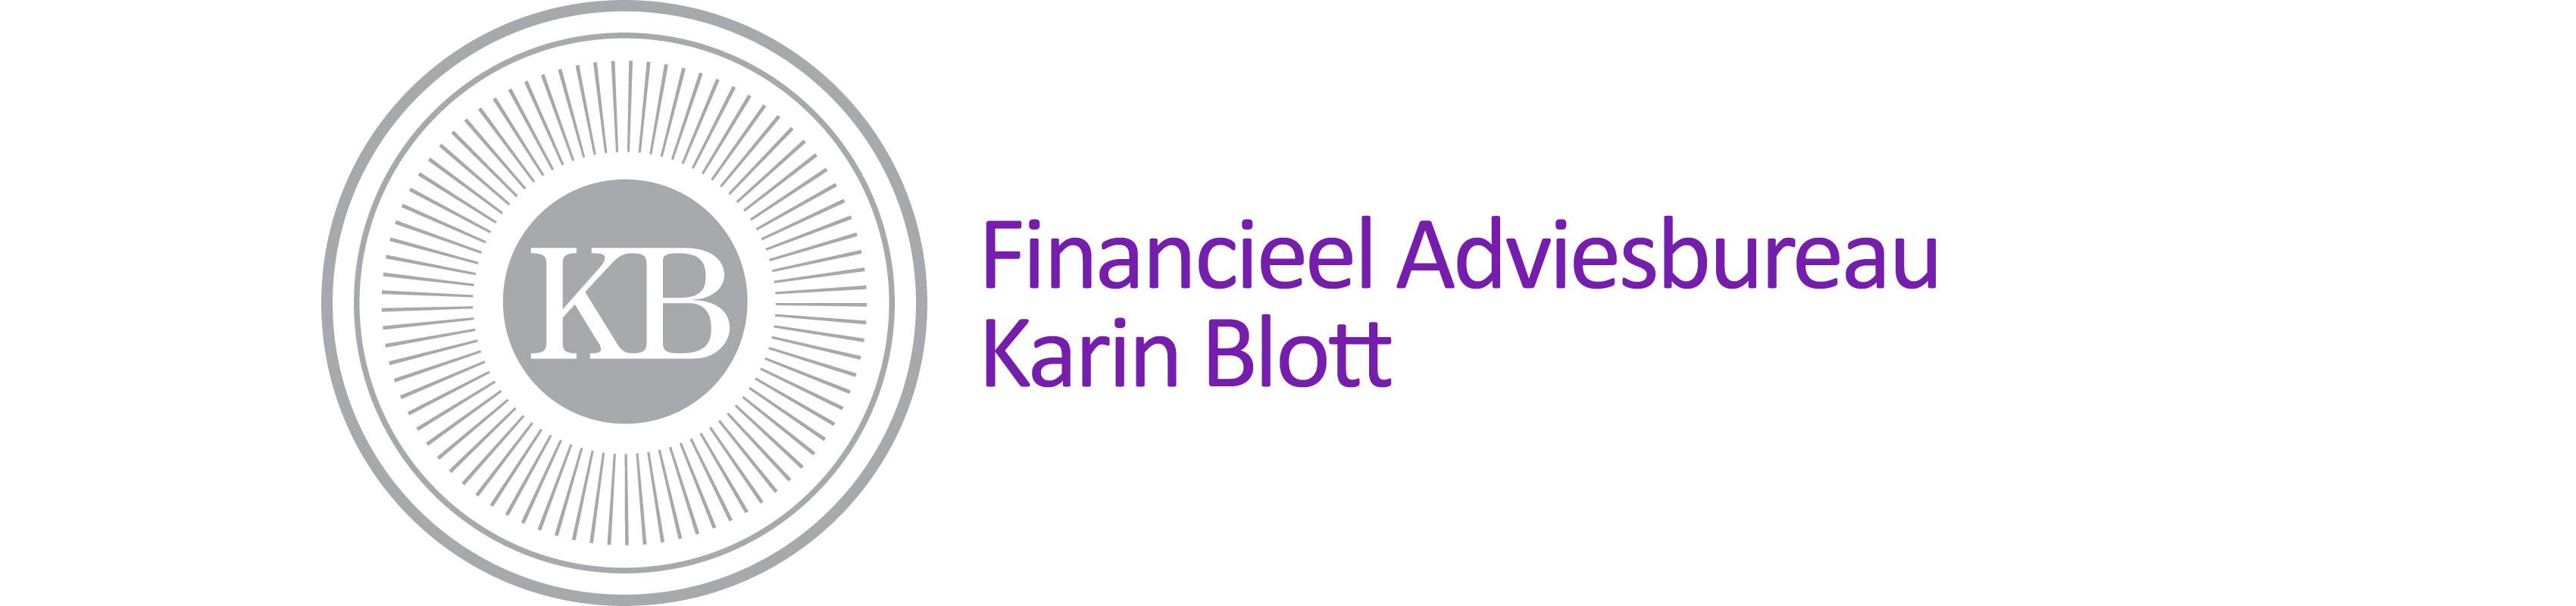 Financieel Adviesbureau Karin Blott